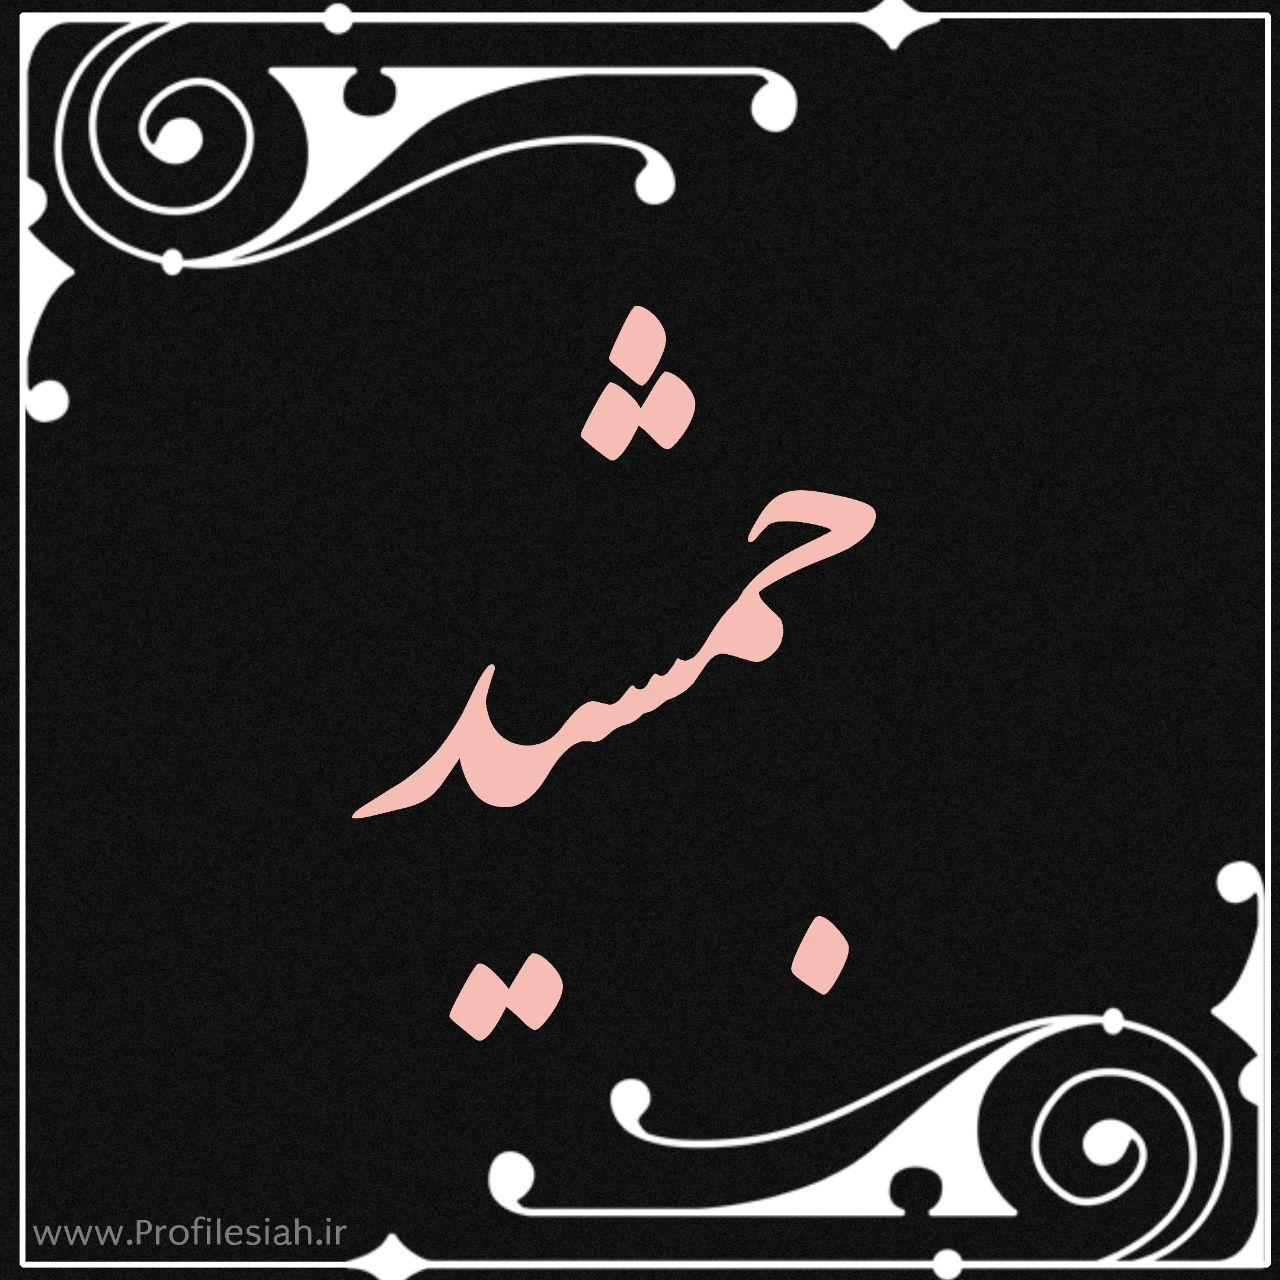 لوگو و عکس نوشته ی اسم جمشید